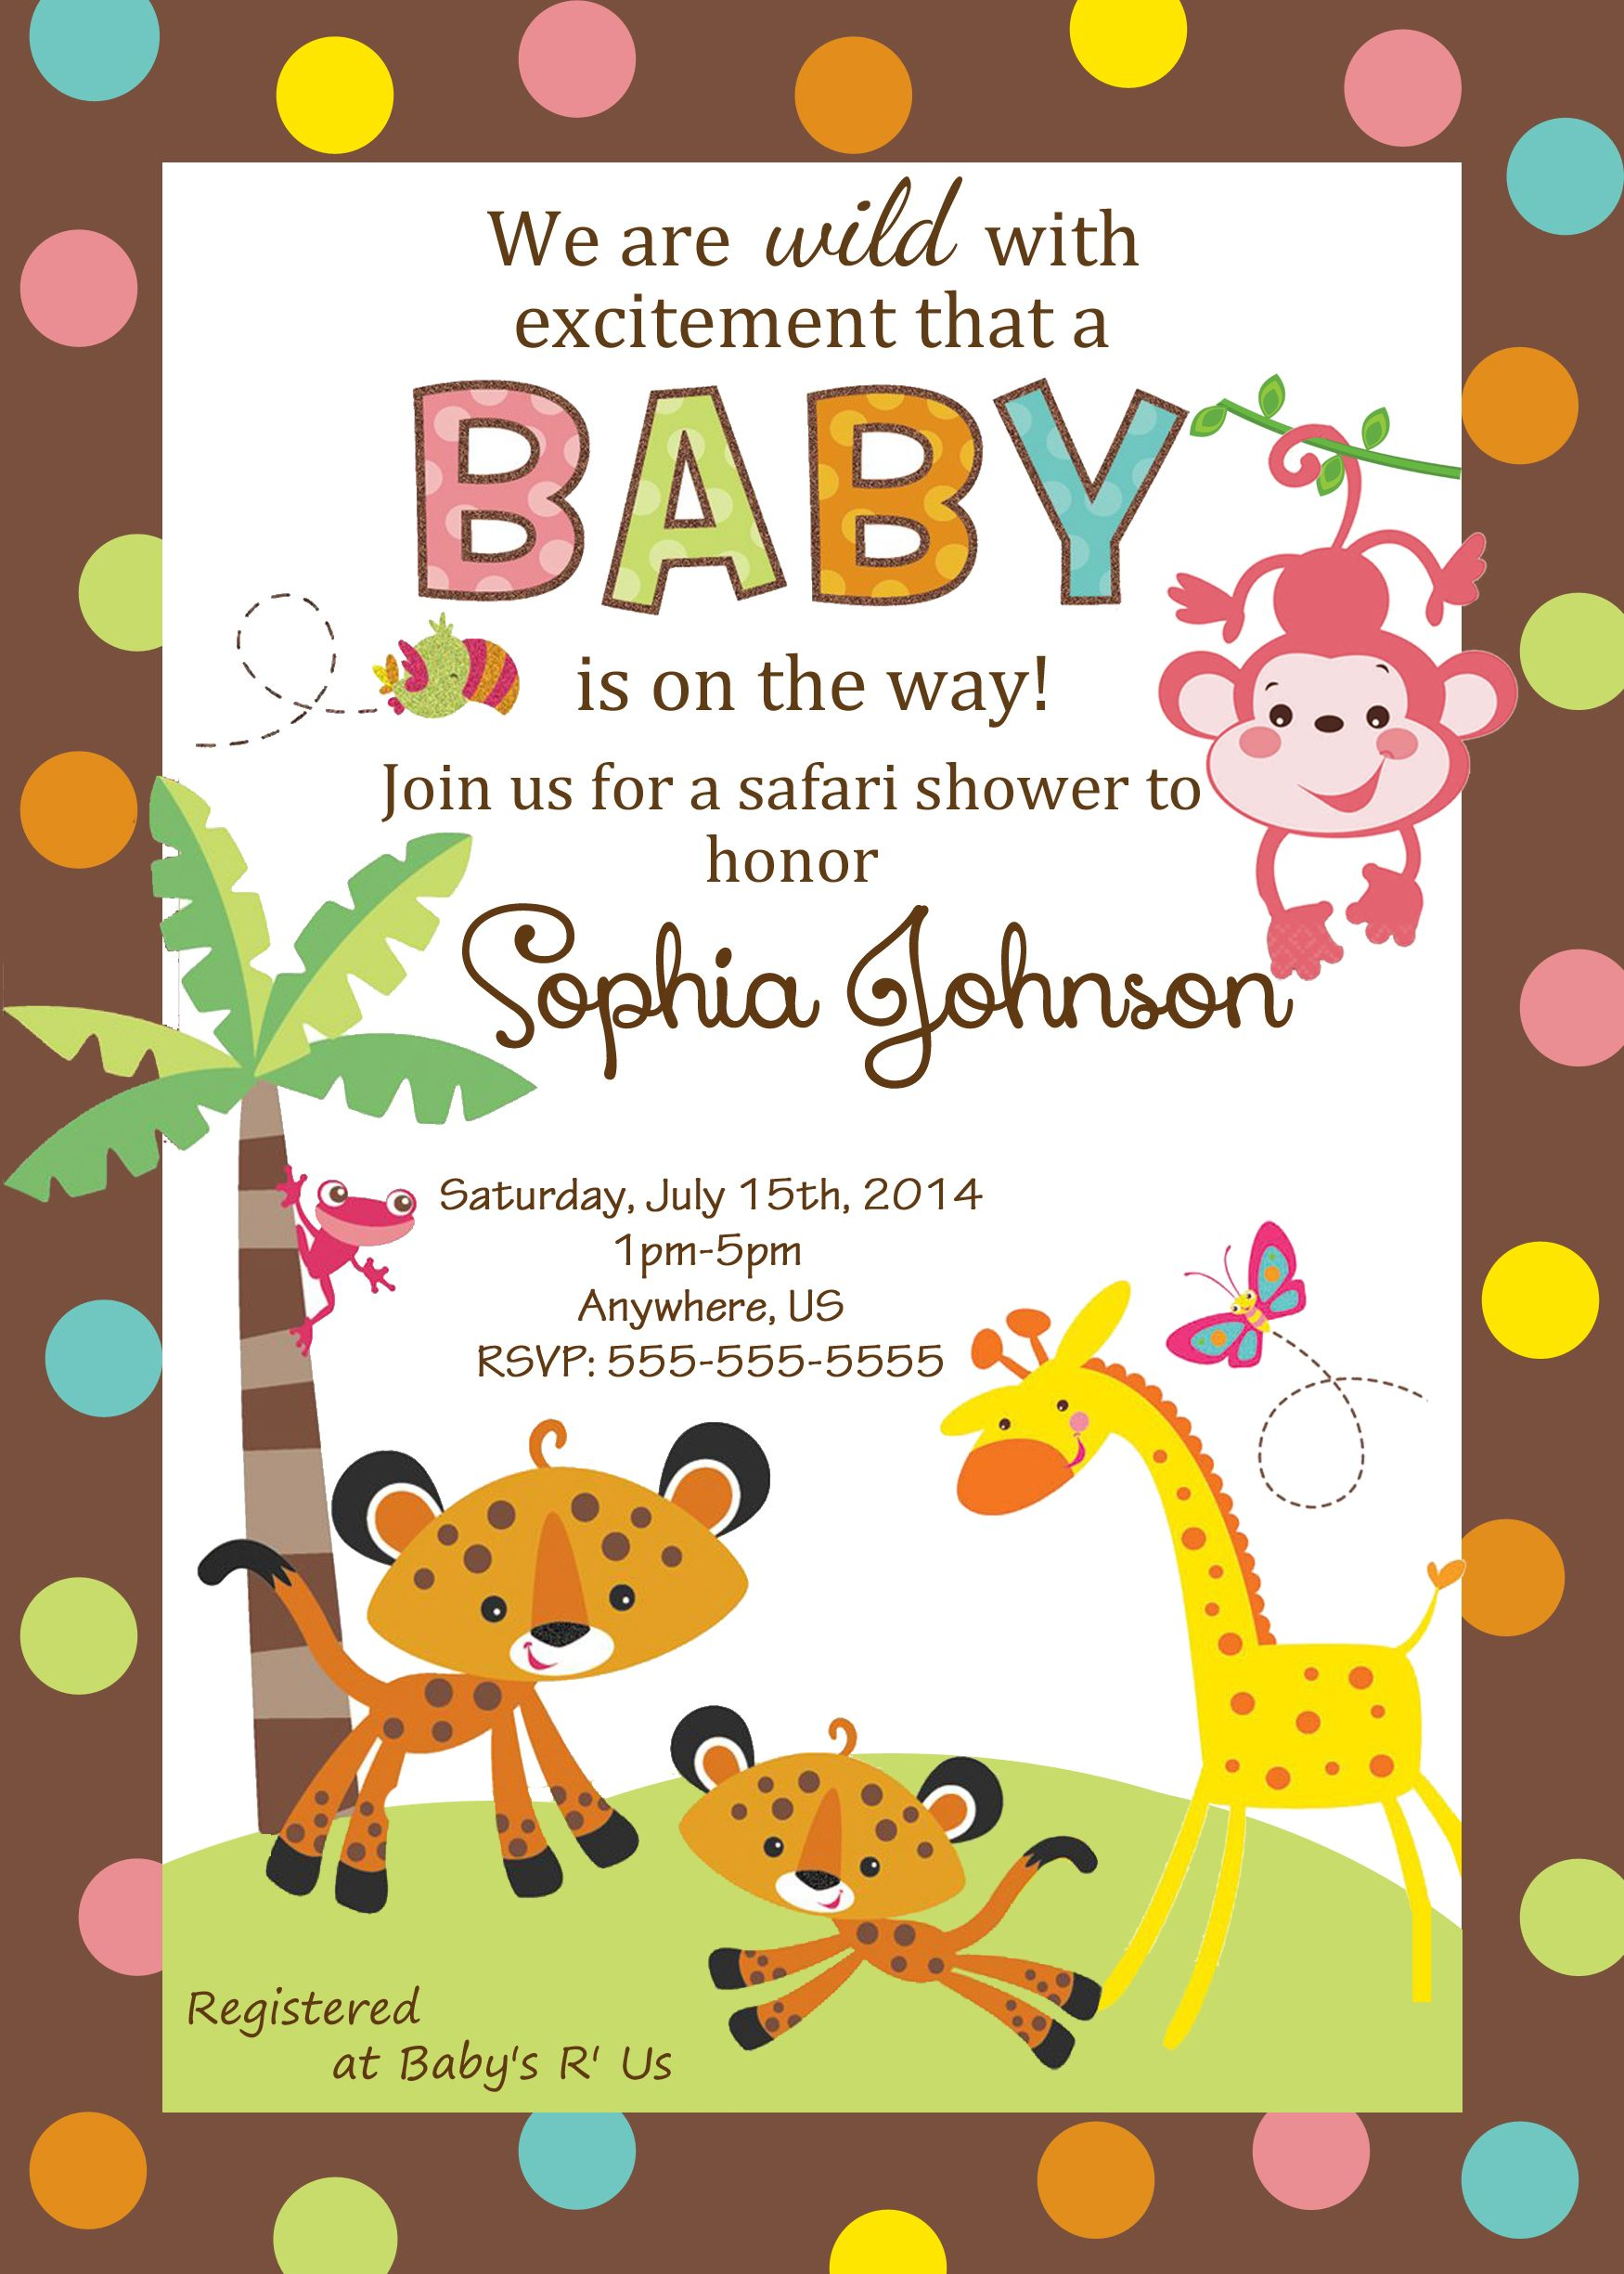 Fisher Price Baby shower custom Invitations $8 99 pink monkey